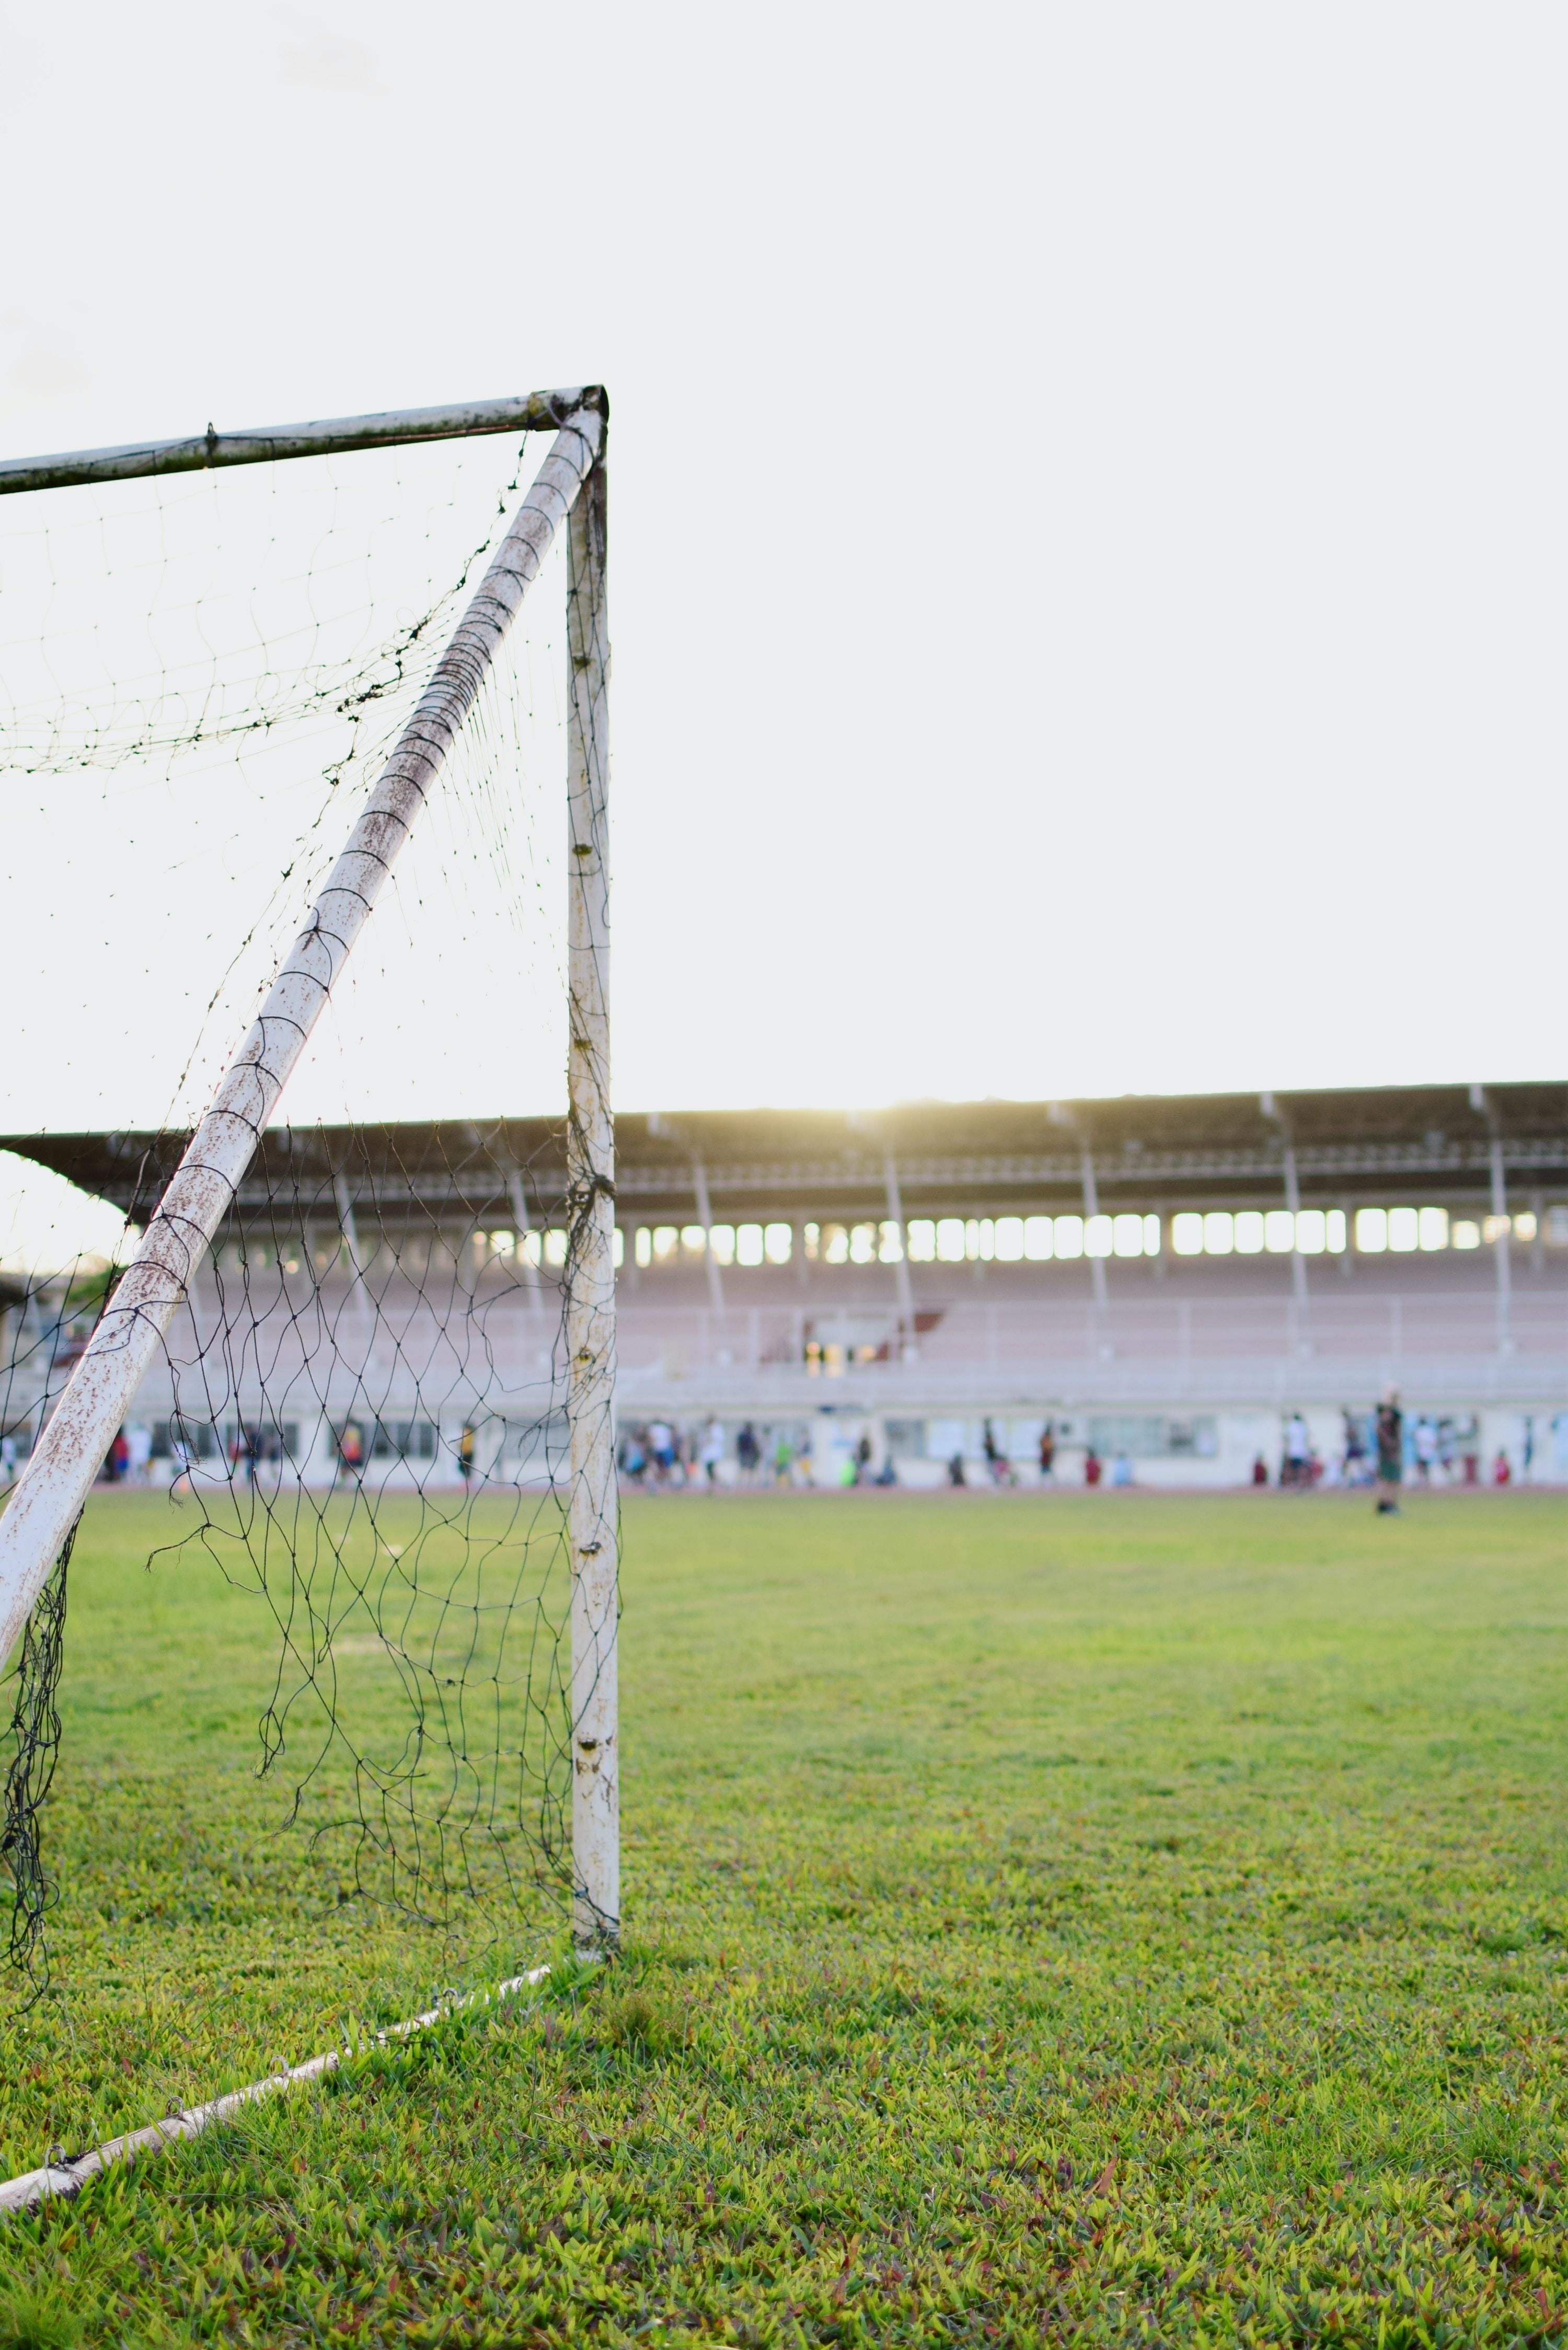 white goalie net on green grass field